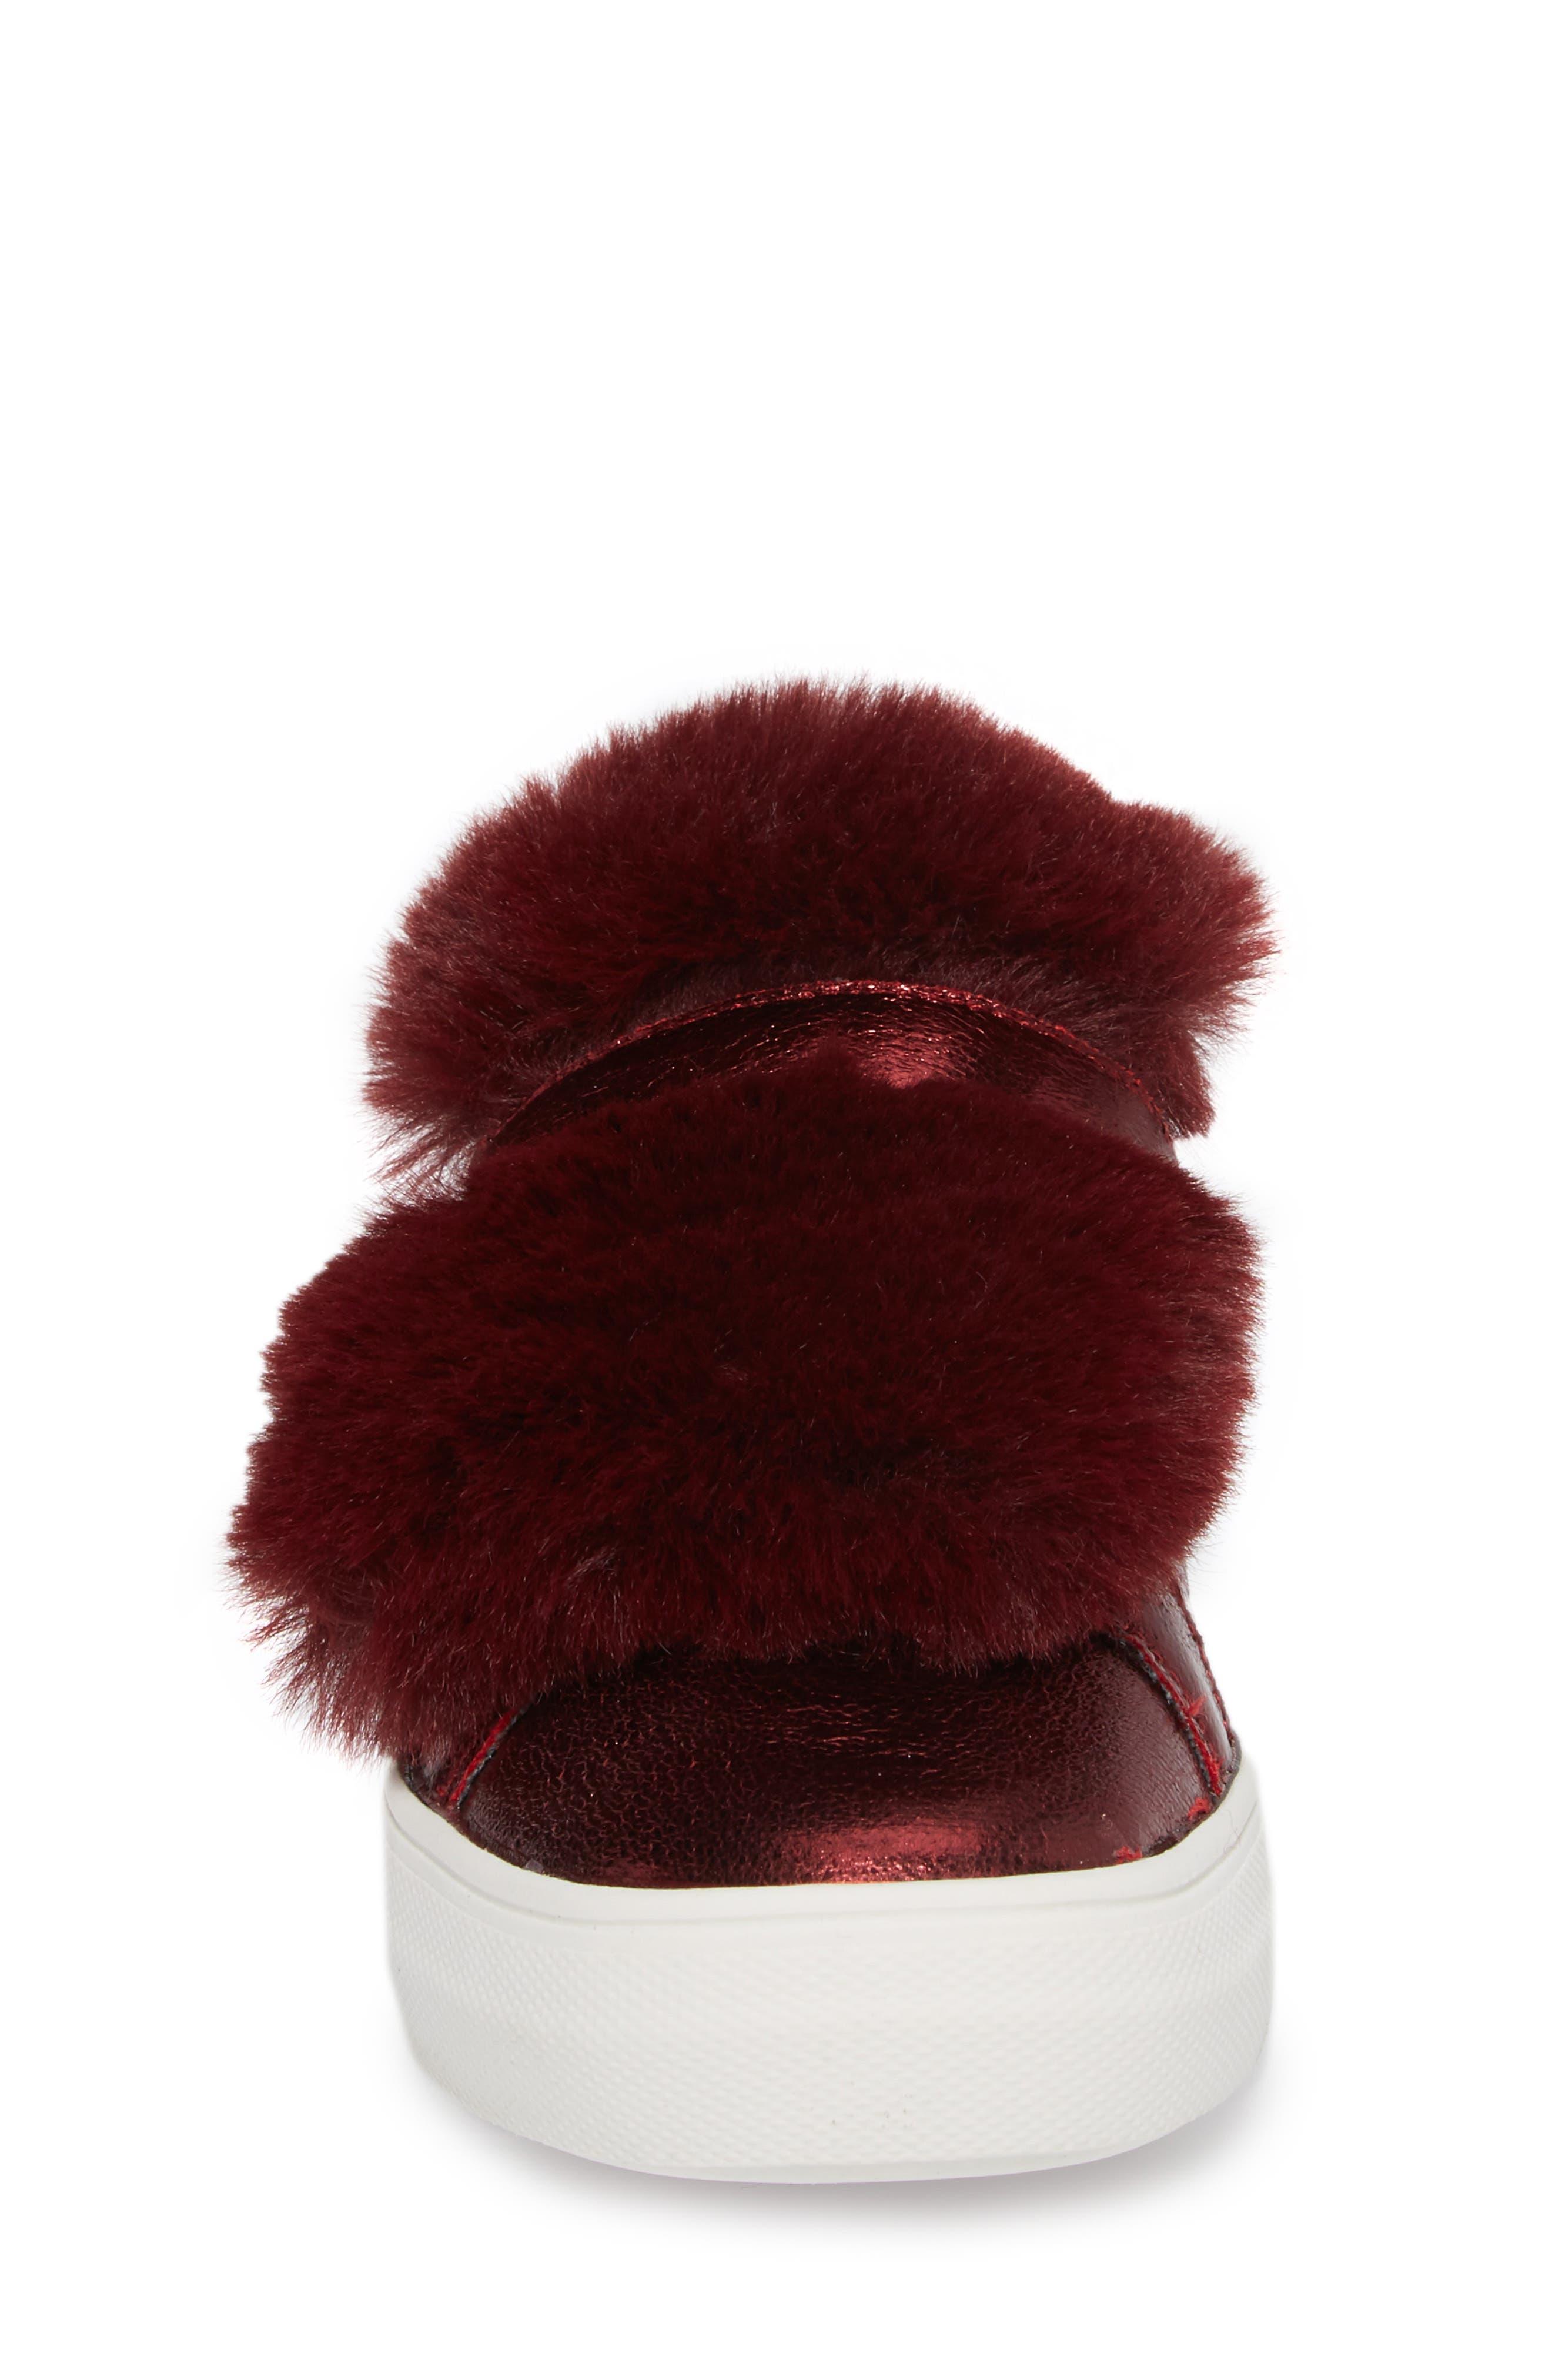 Zandra Faux Fur Metallic Sneaker,                             Alternate thumbnail 4, color,                             930